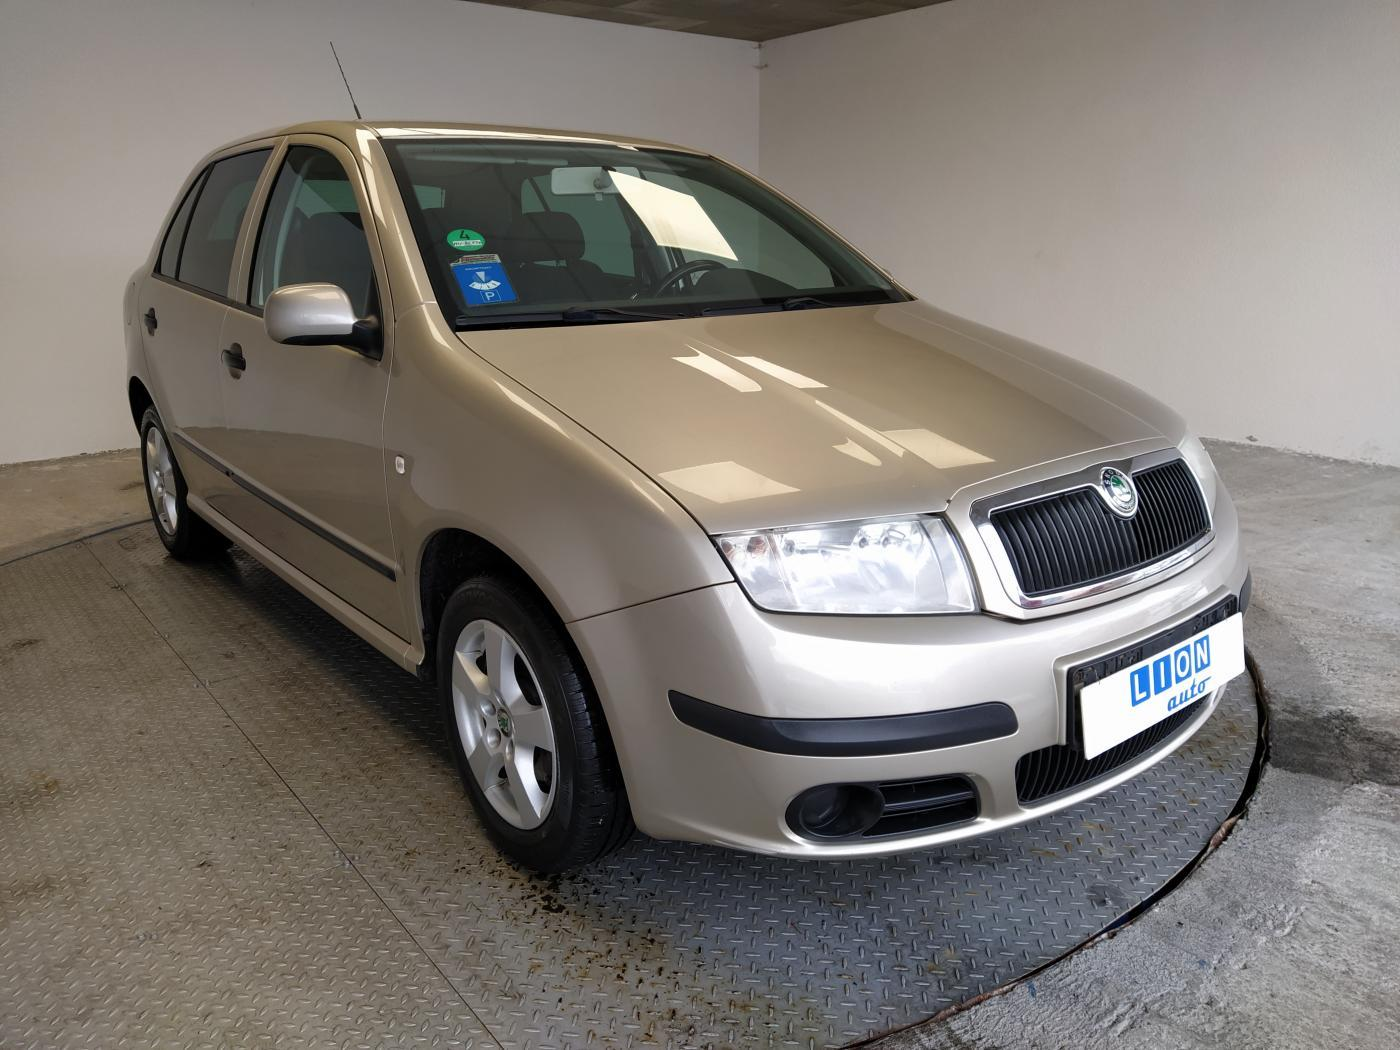 Škoda Fabia 1.4 16V SPORT hatchback